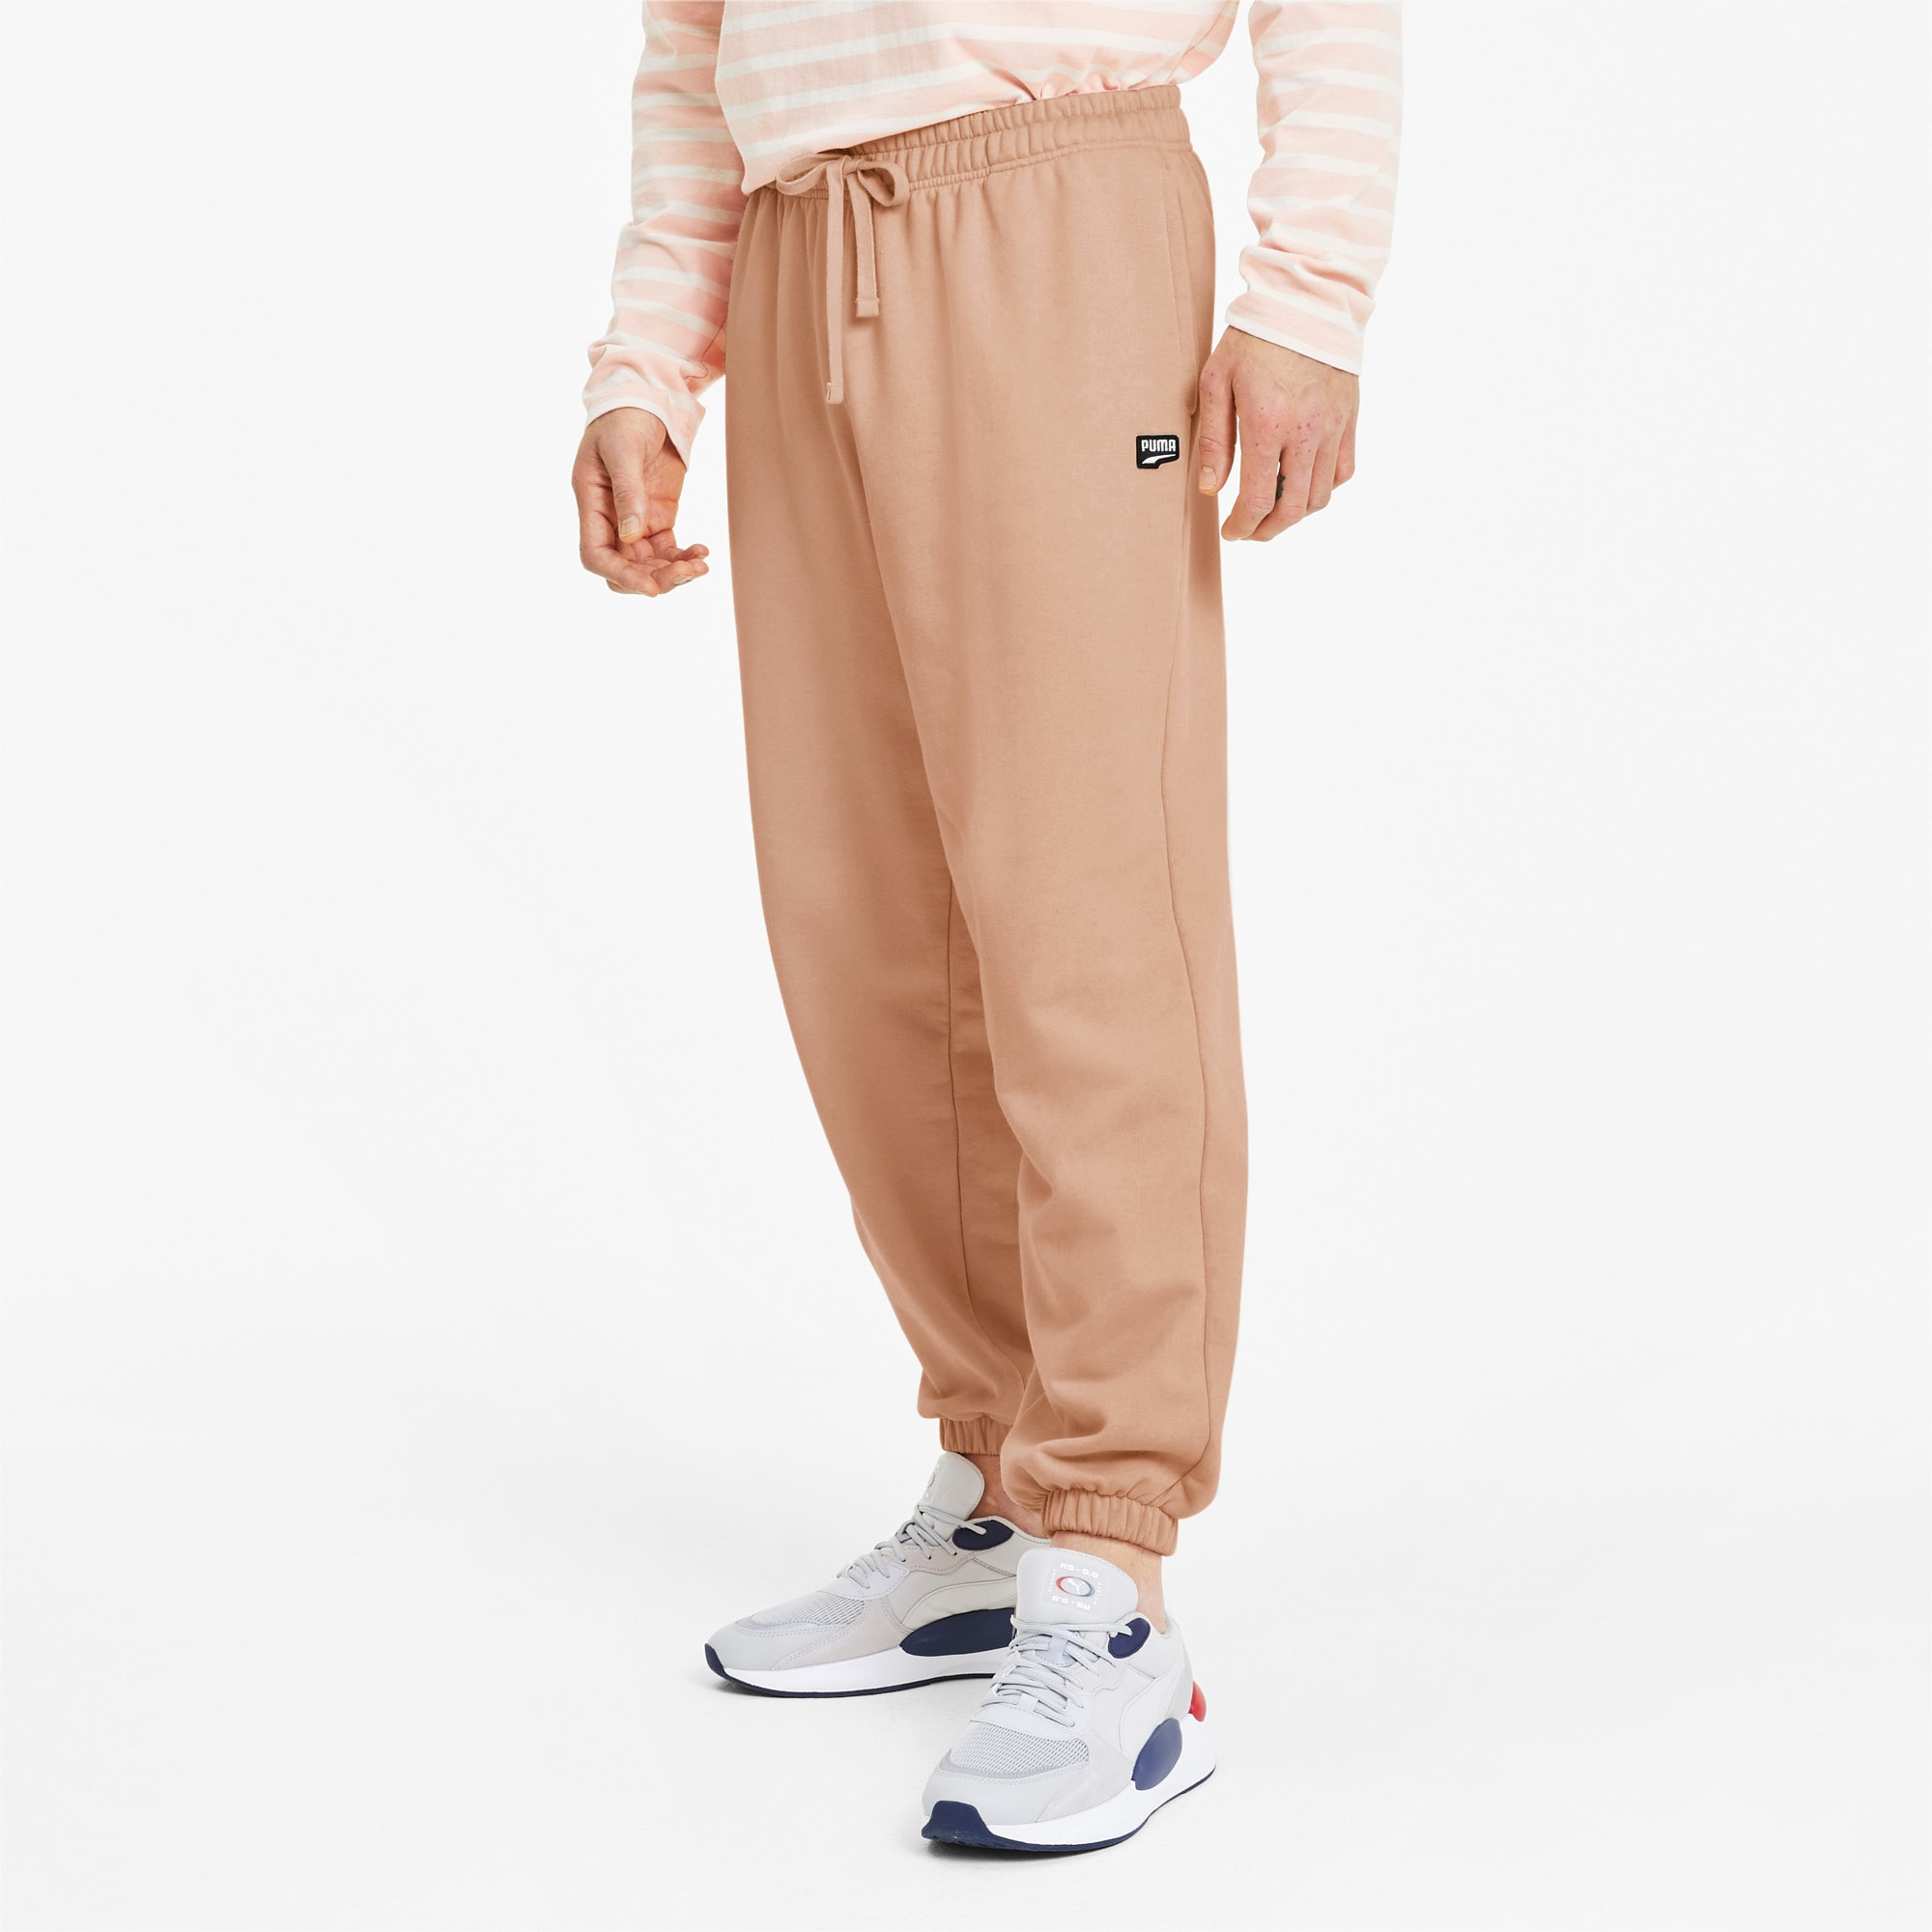 Downtown Men's Sweatpants